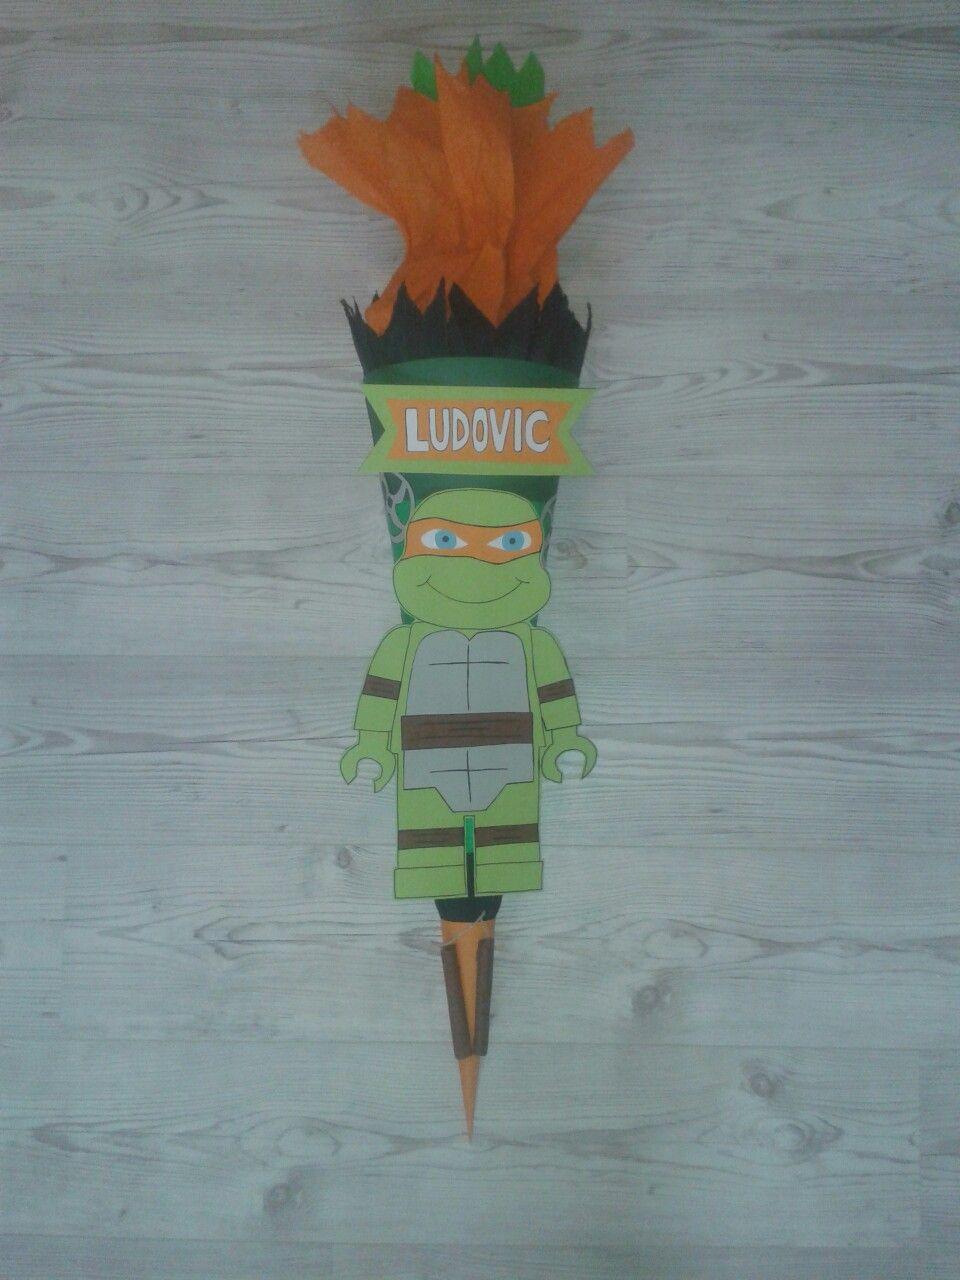 Teenage Mutant Ninja Turtles Schultüte Zuckertüte Selbstgebastelt